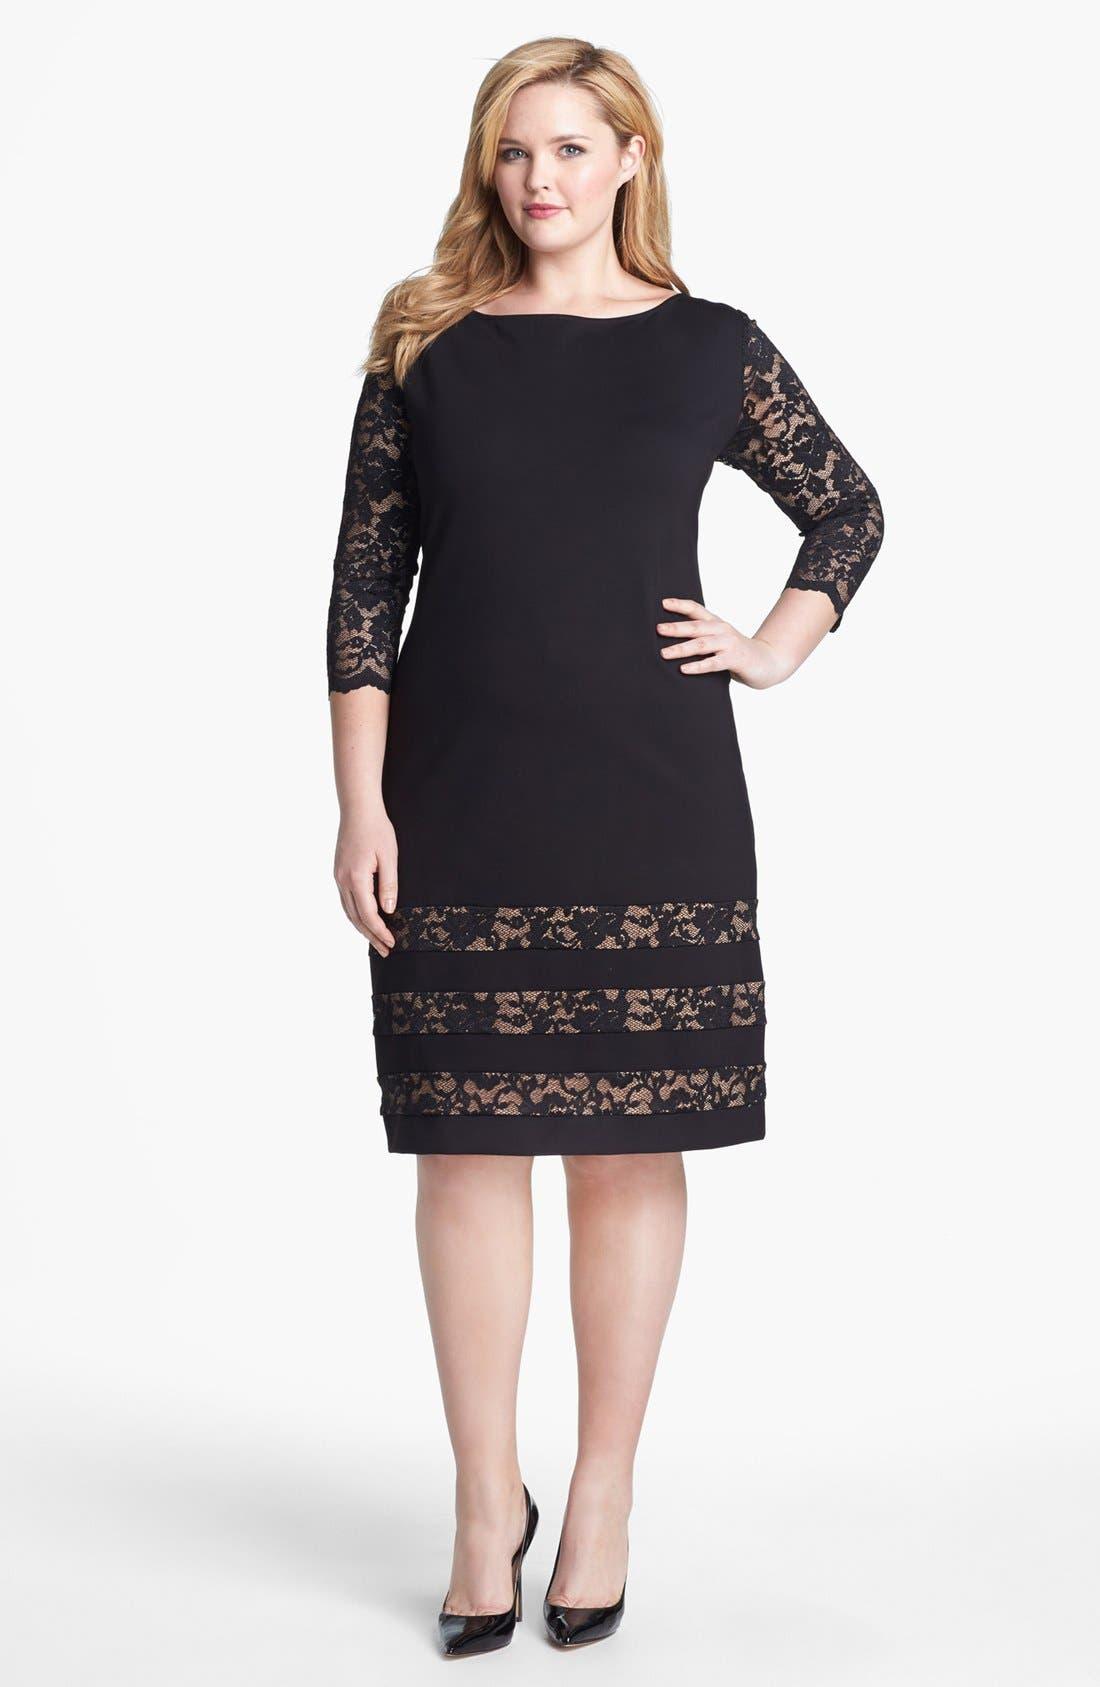 Main Image - ABS by Allen Schwartz Lace Detail Sheath Dress (Plus Size)